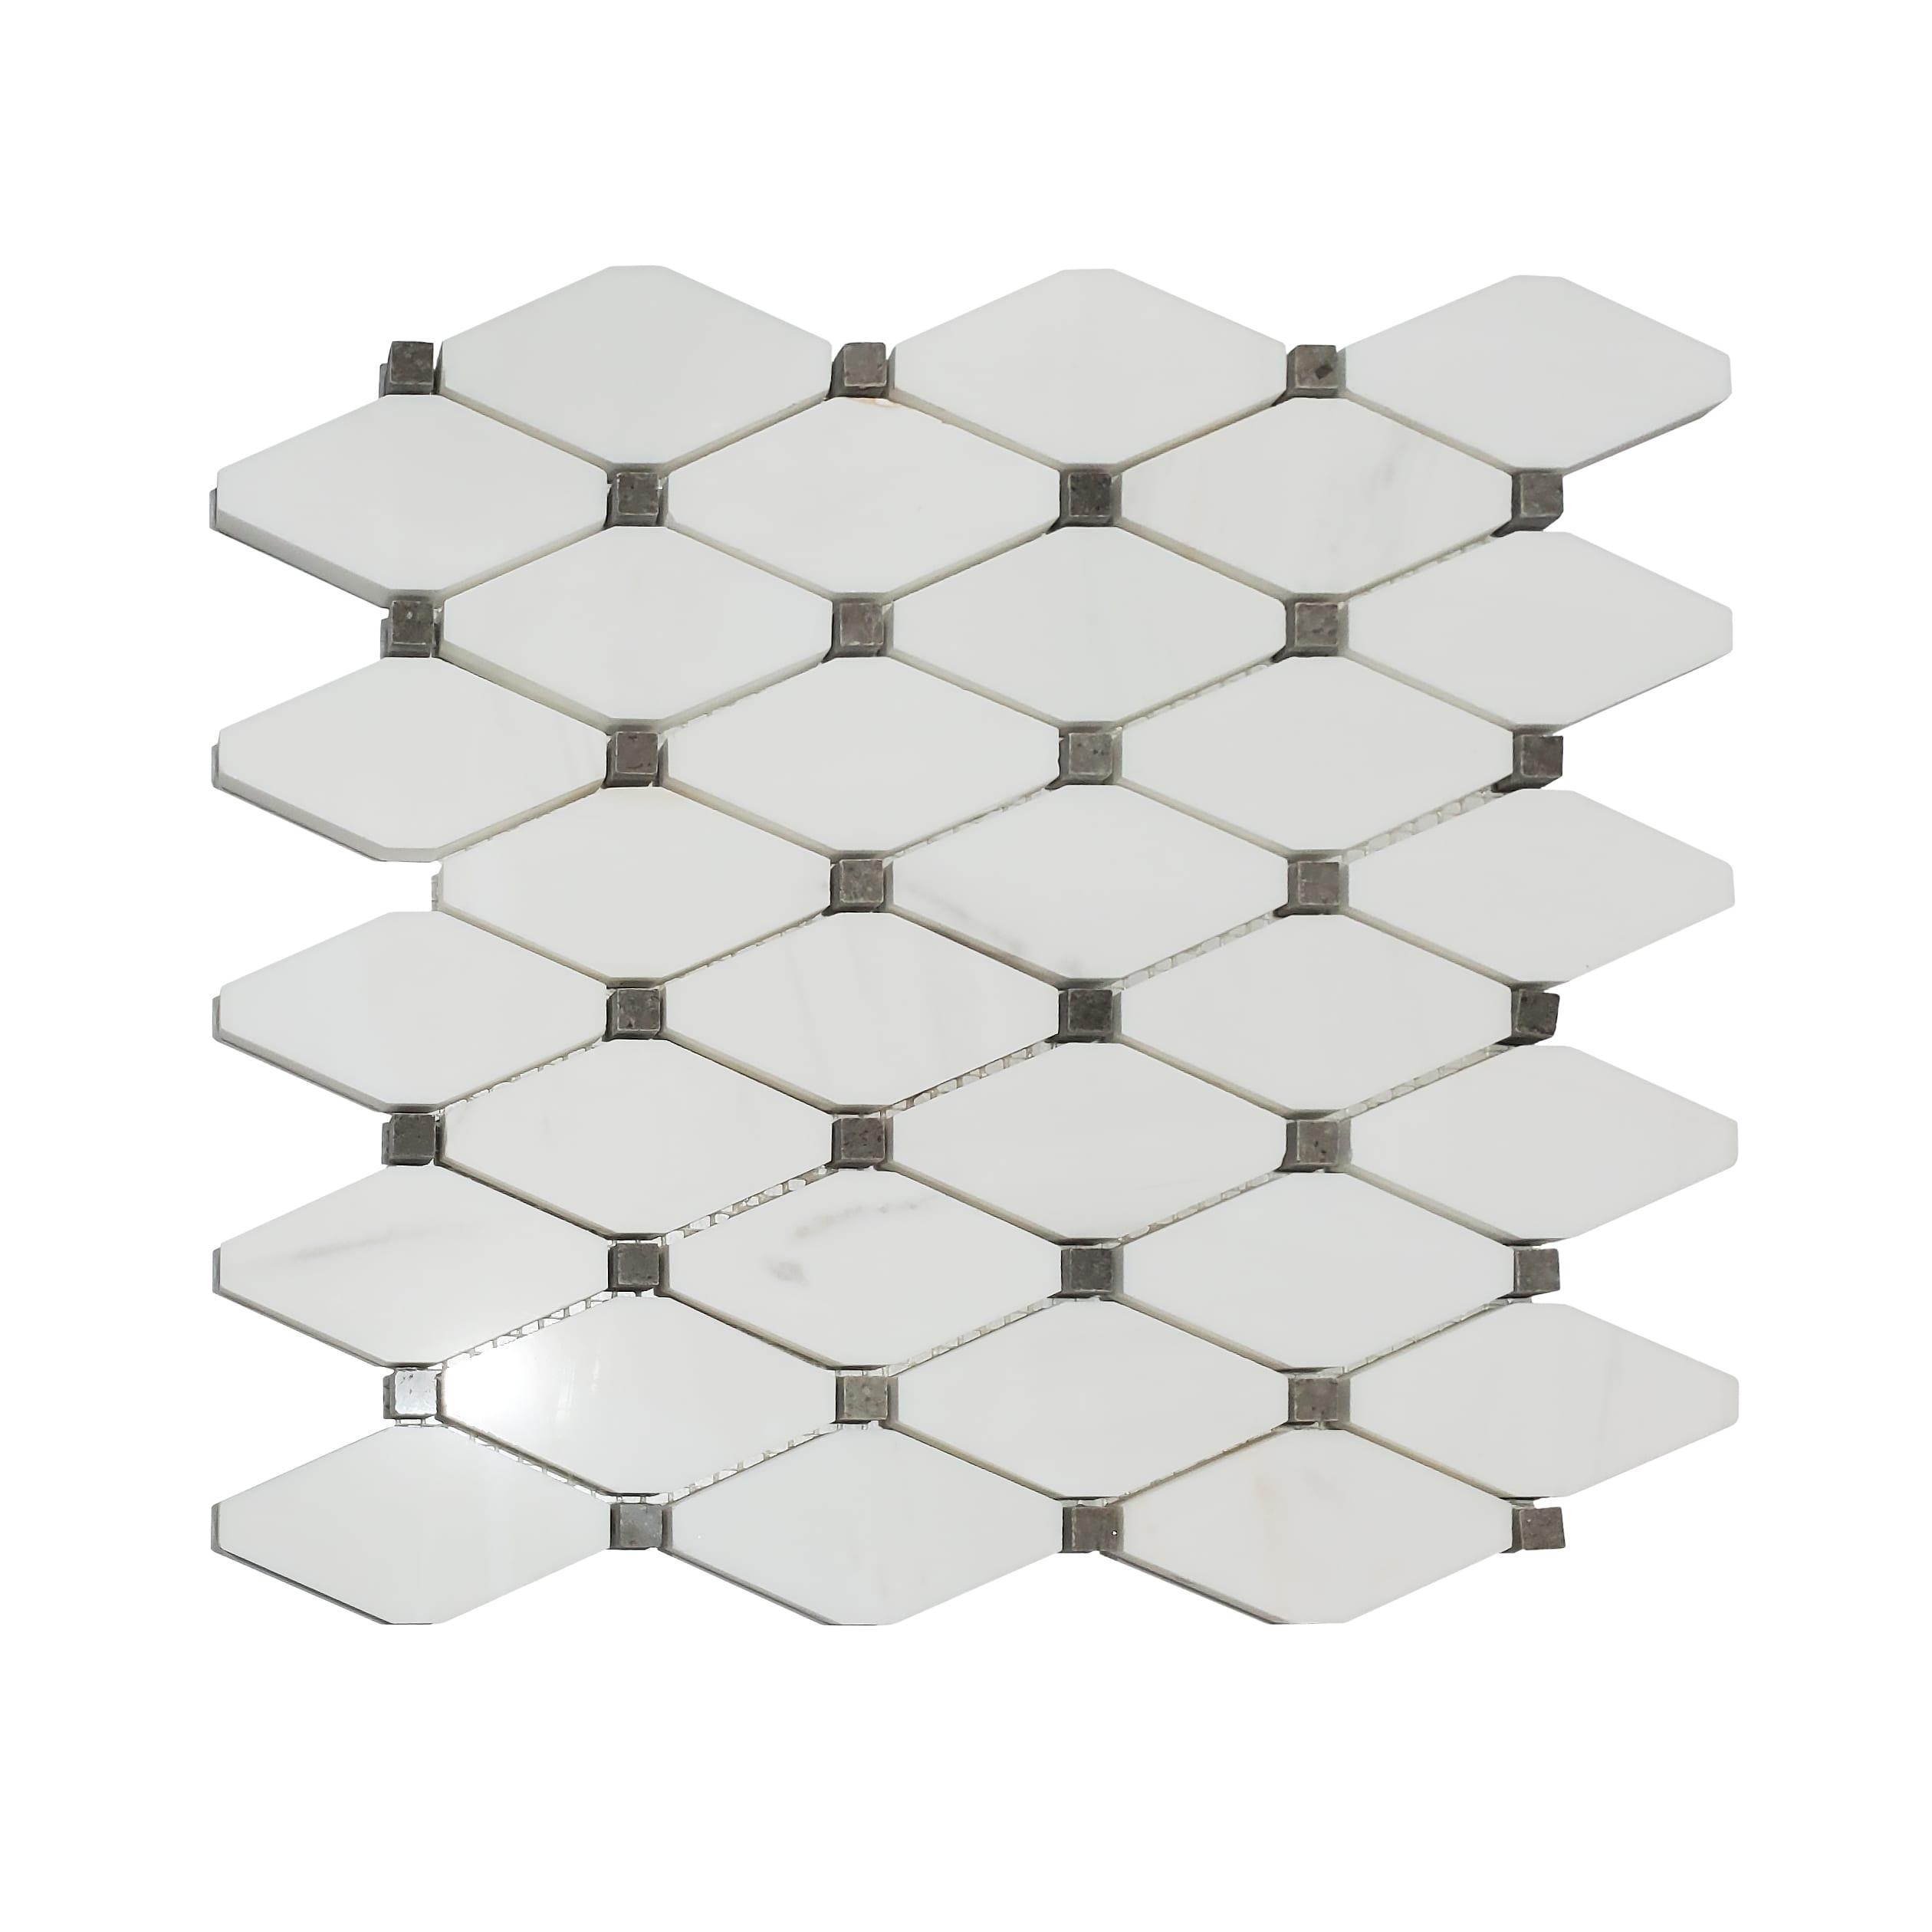 Long Octagon Mosaic_Dolomite_33.98_19.99